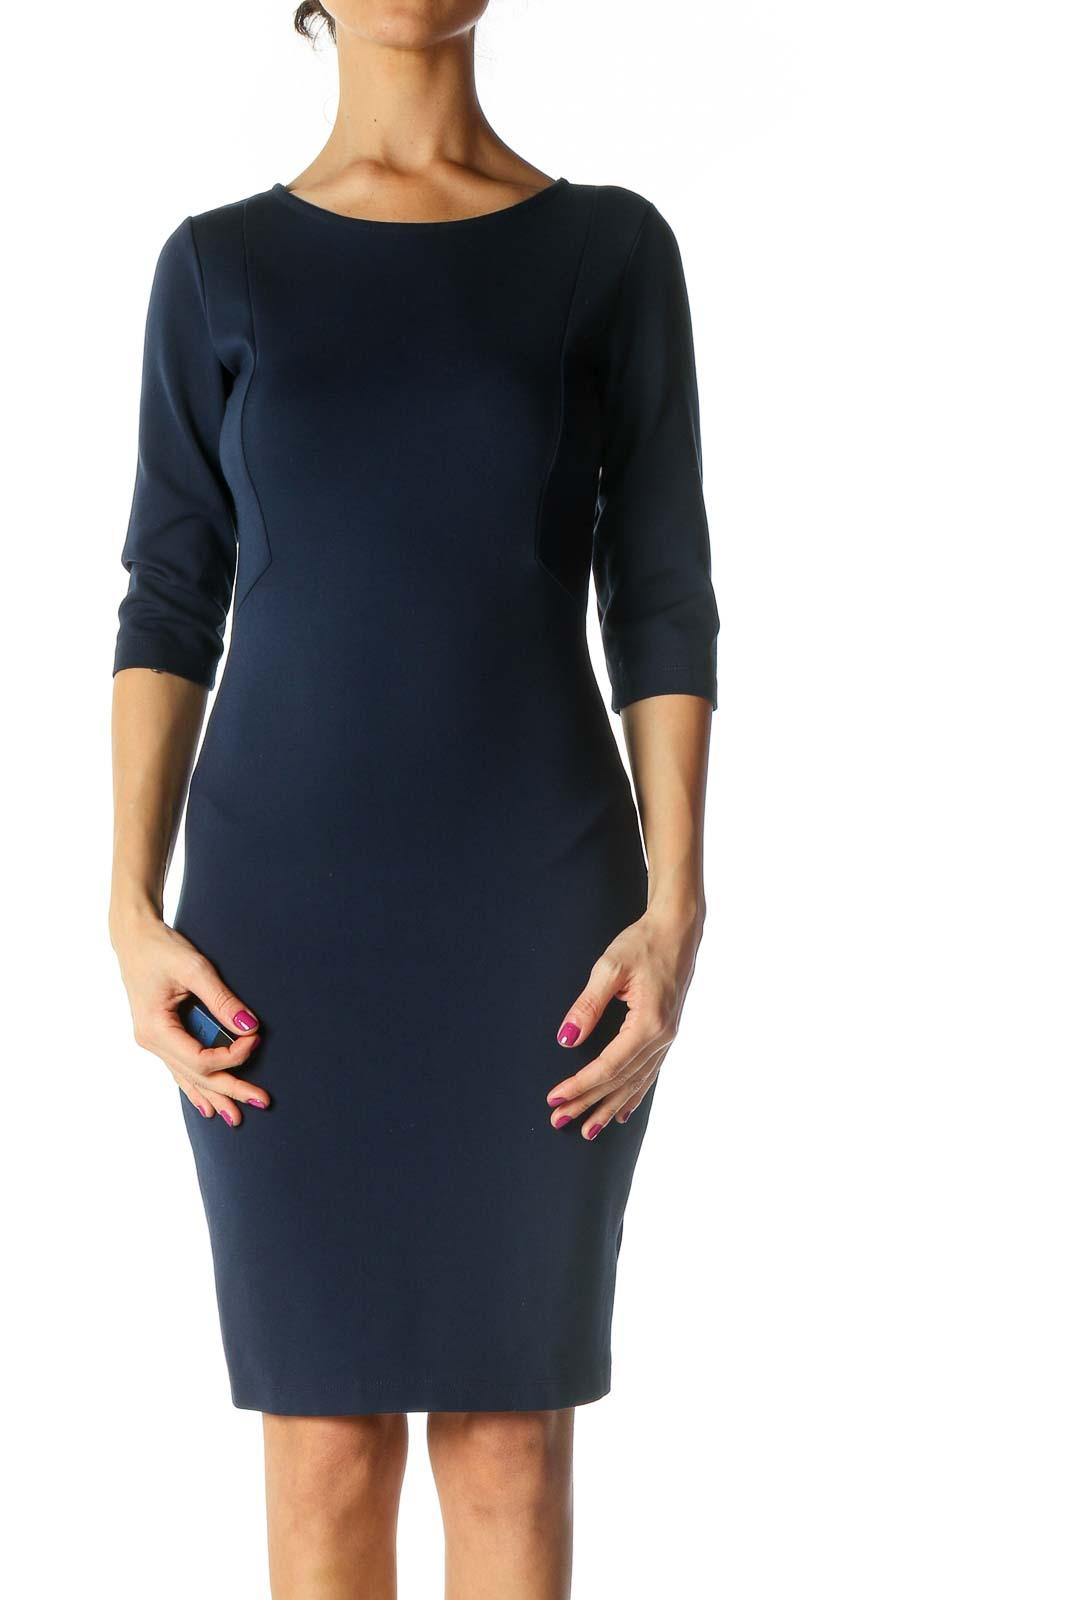 Blue Solid Sheath Dress Front